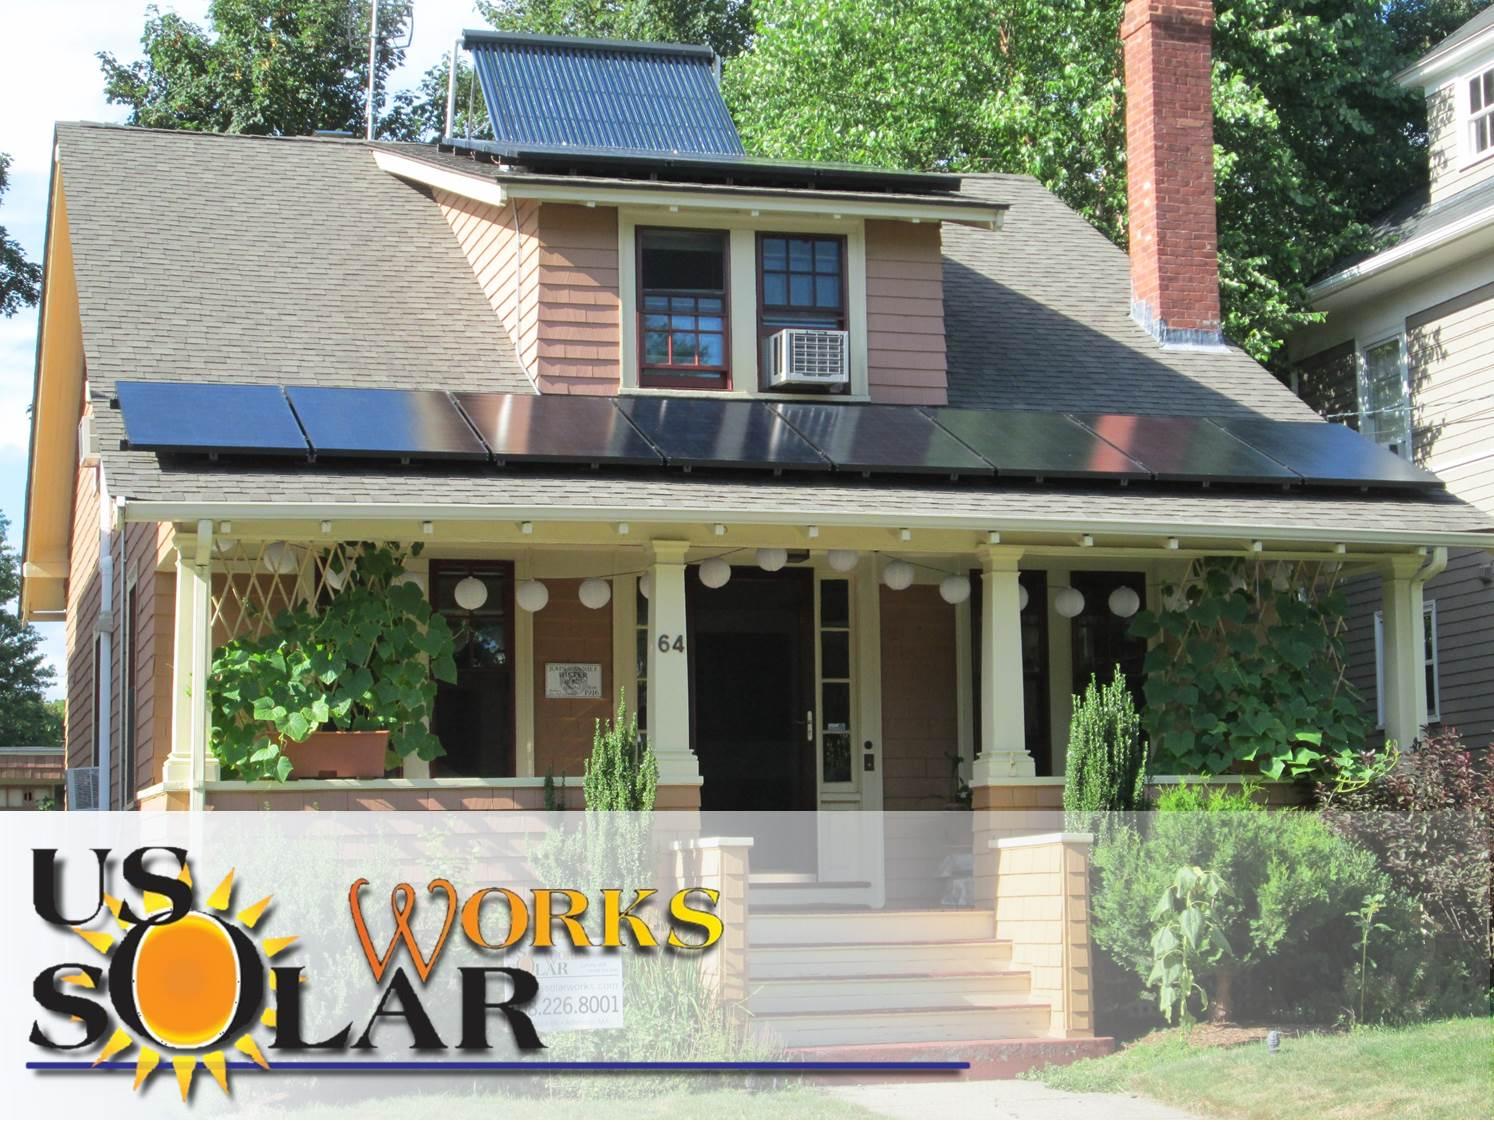 Residential solar array in Providence, RI